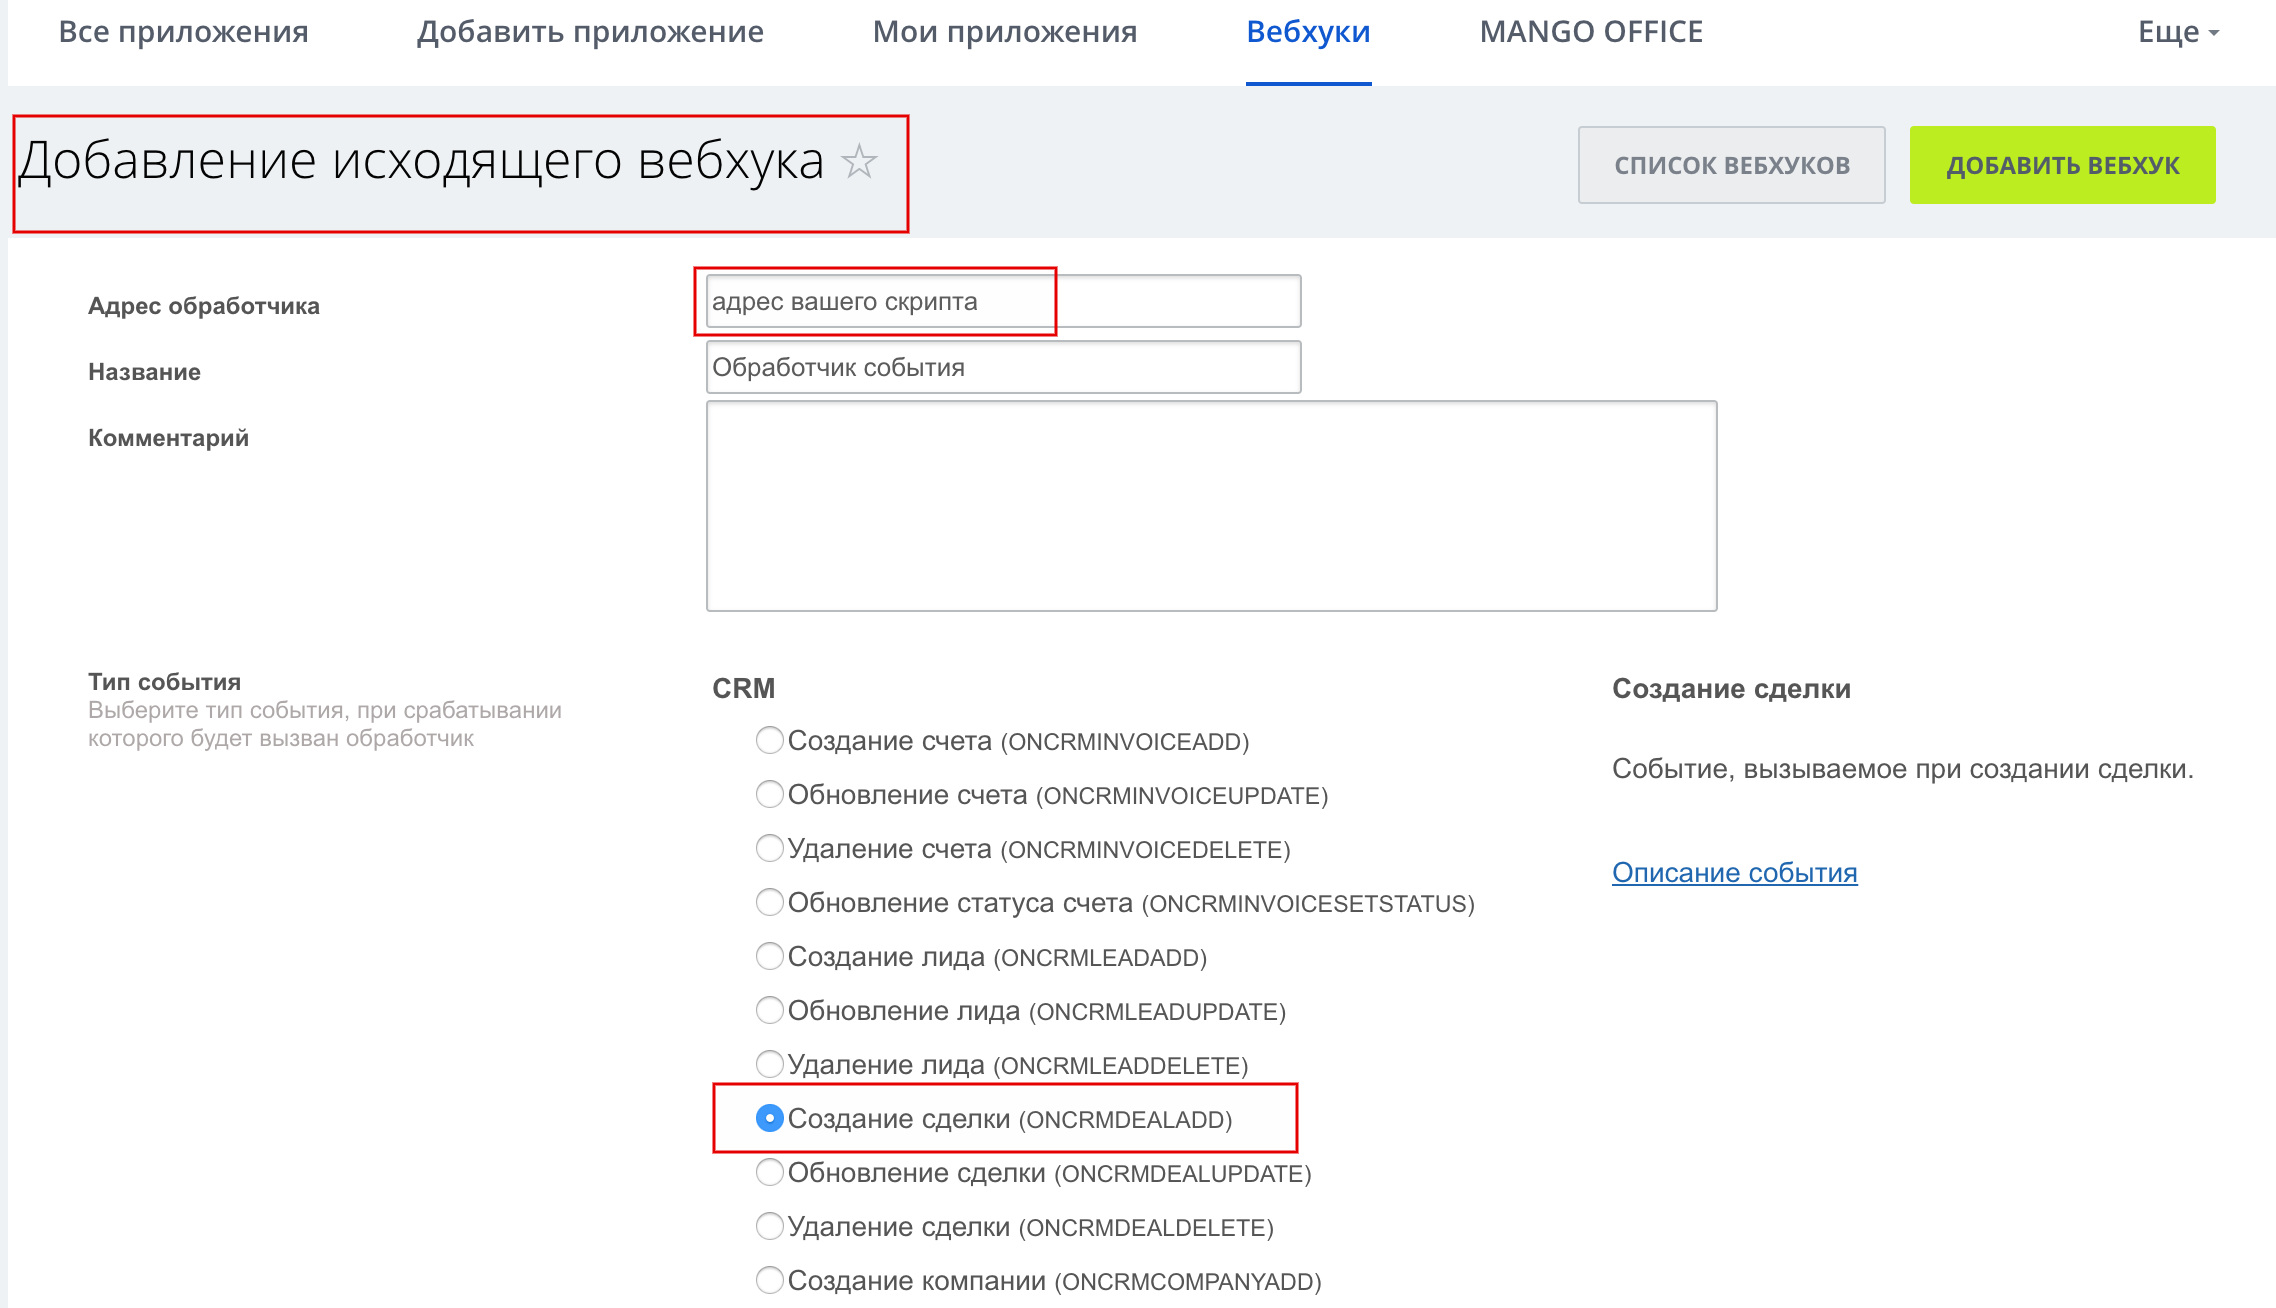 Битрикс24 интеграция с modx 301 редирект со страниц без слеша на слешем битрикс